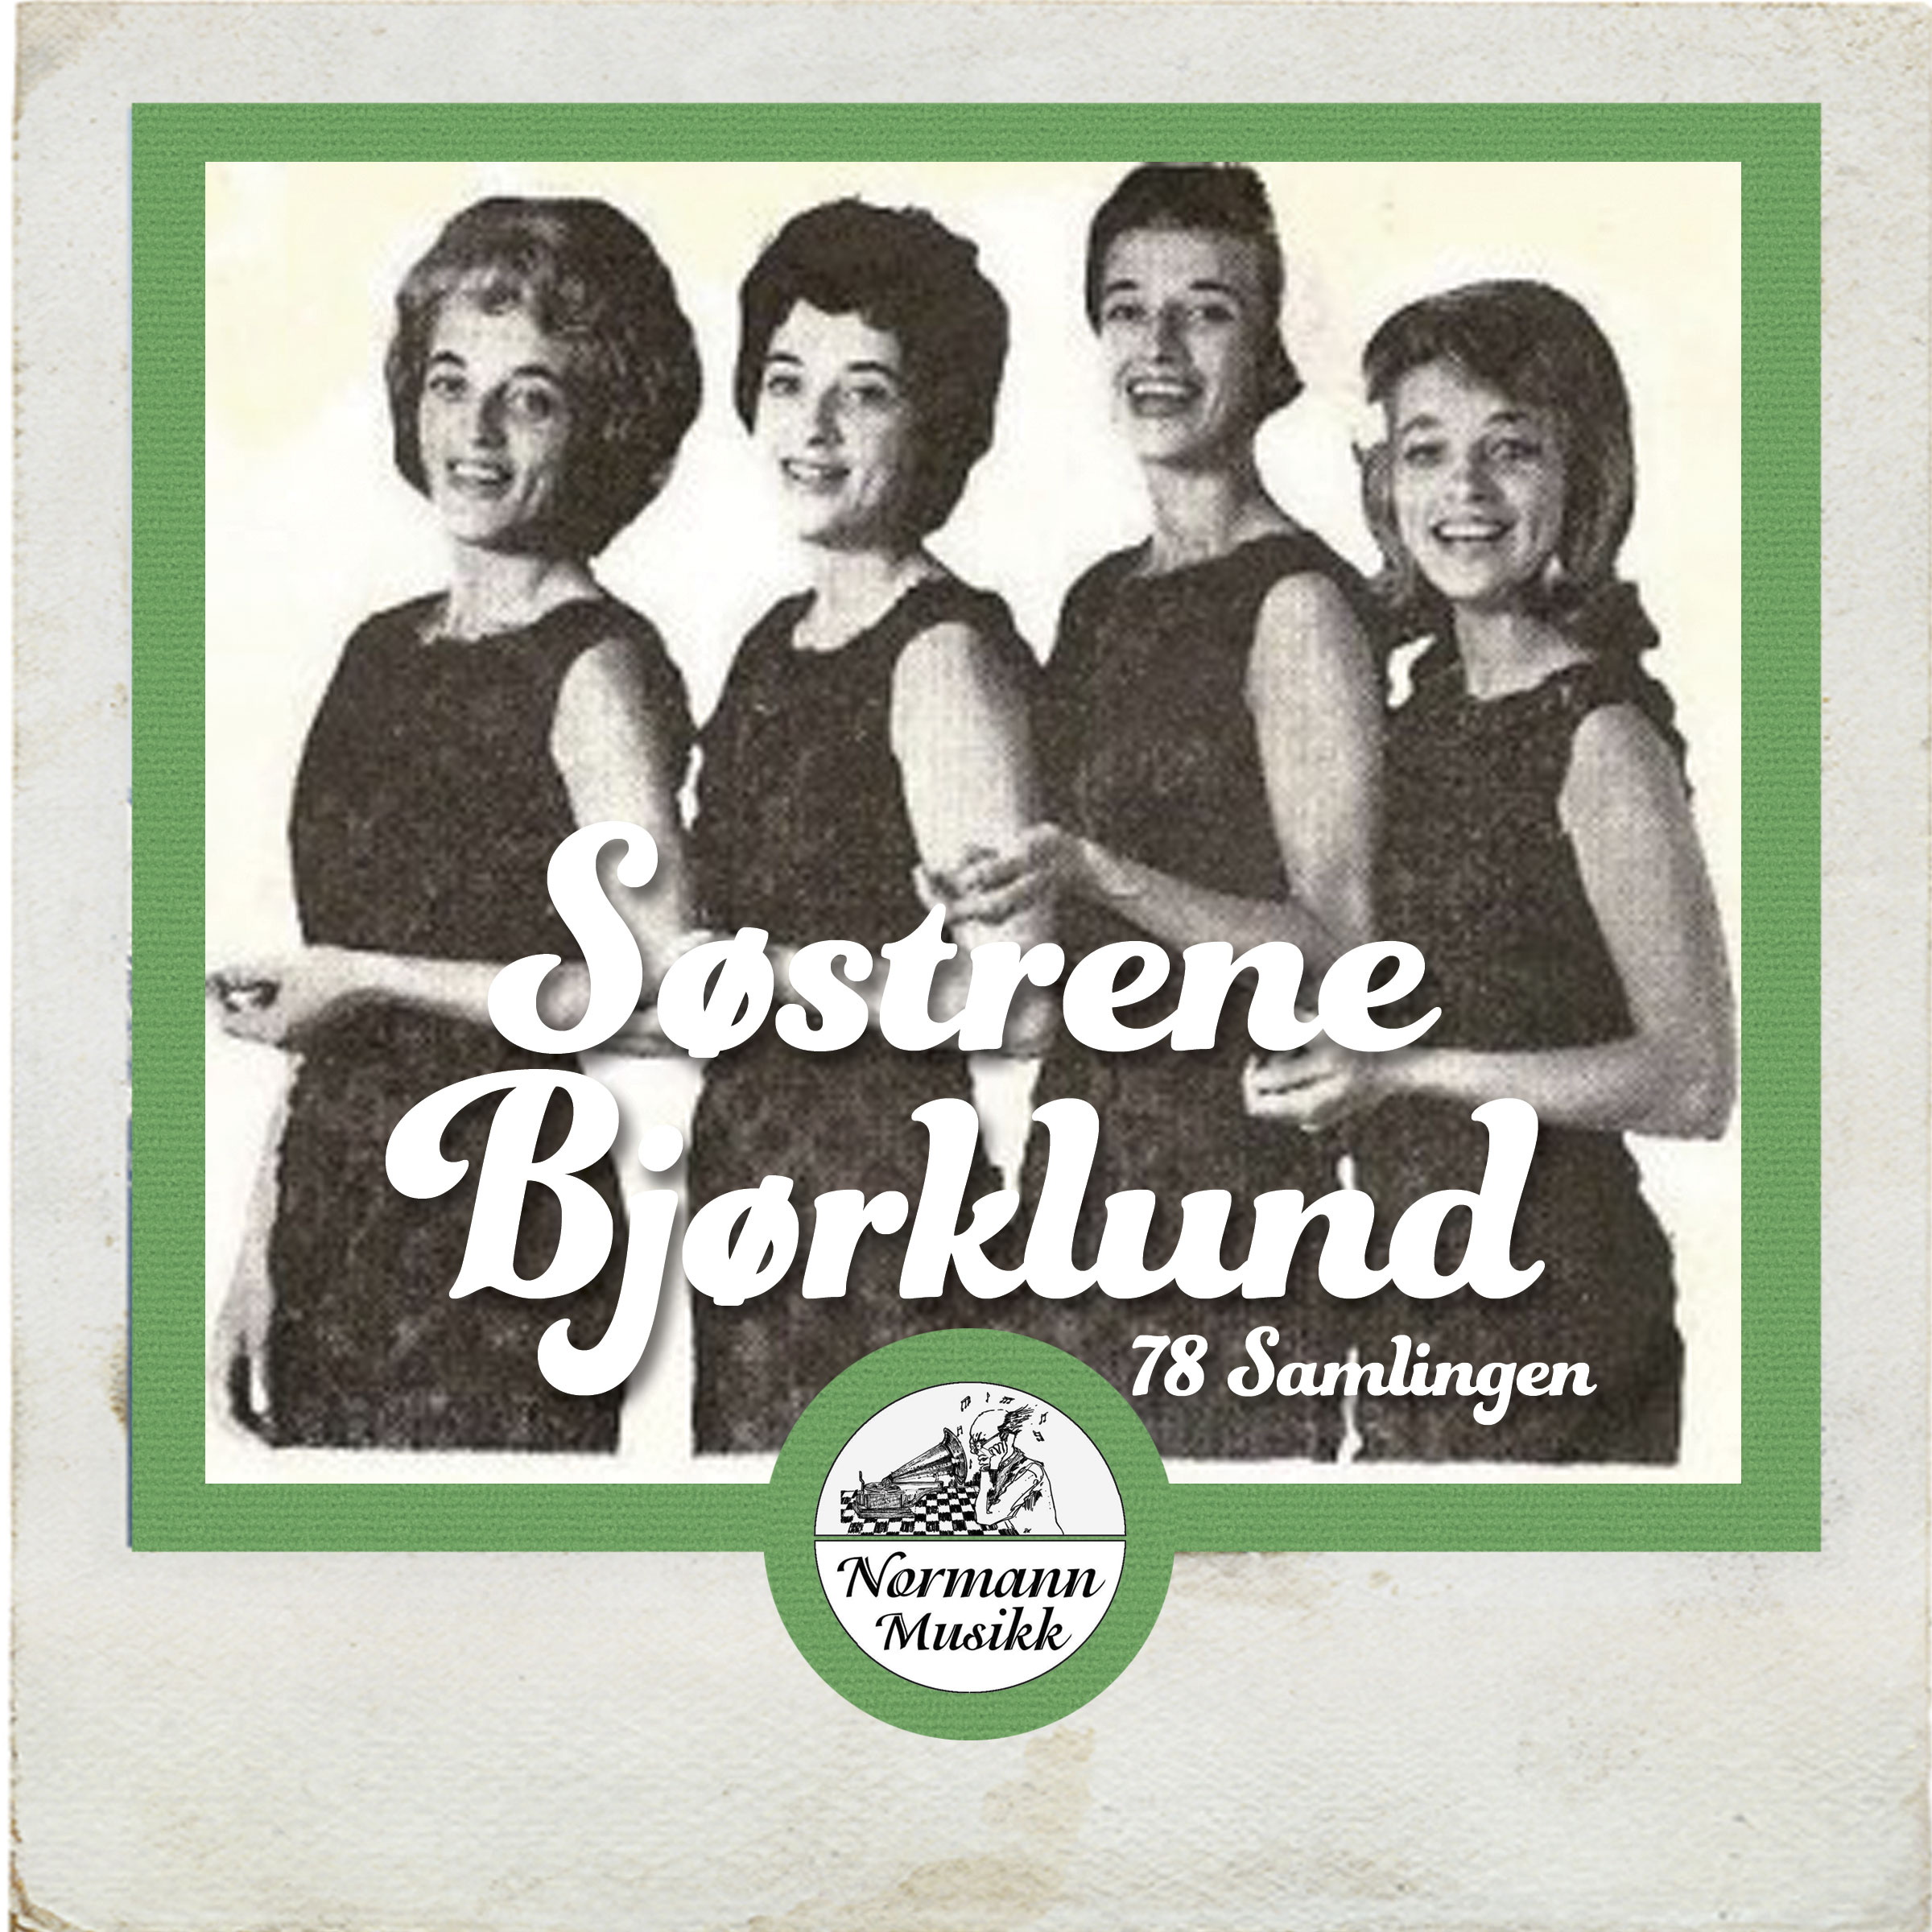 Søstrene Bjørklund